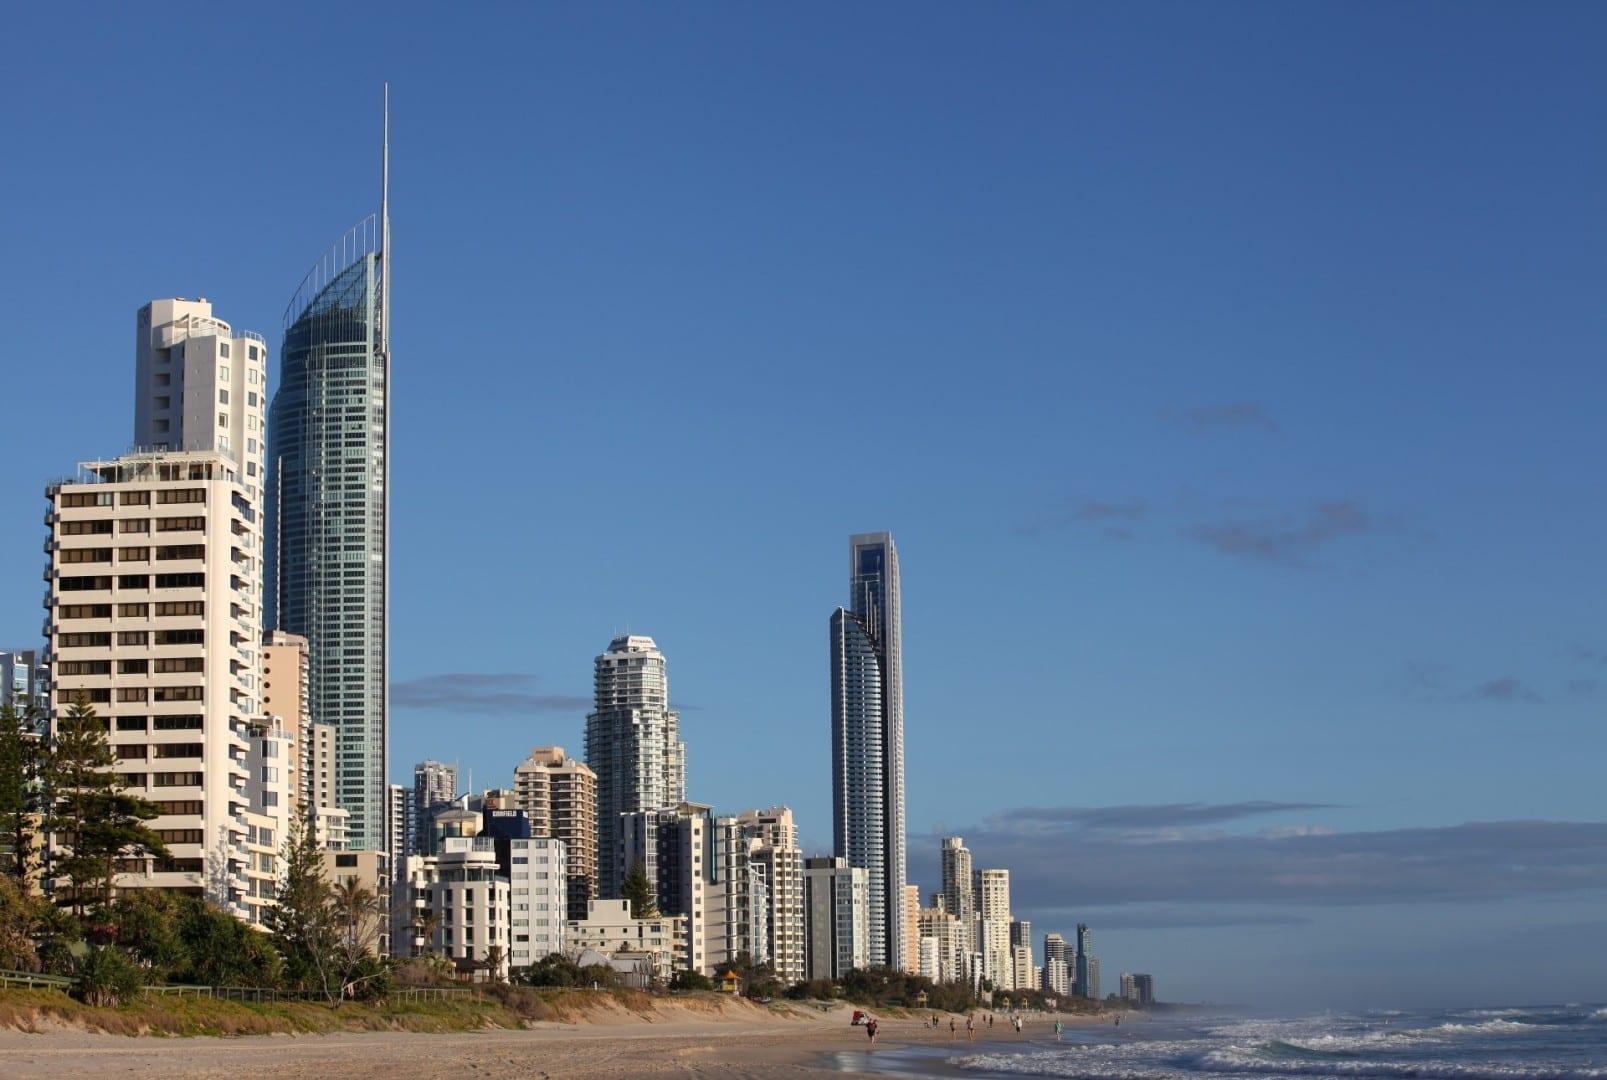 Skyline de Surfers Paradise, Gold Coast Gold Coast Australia